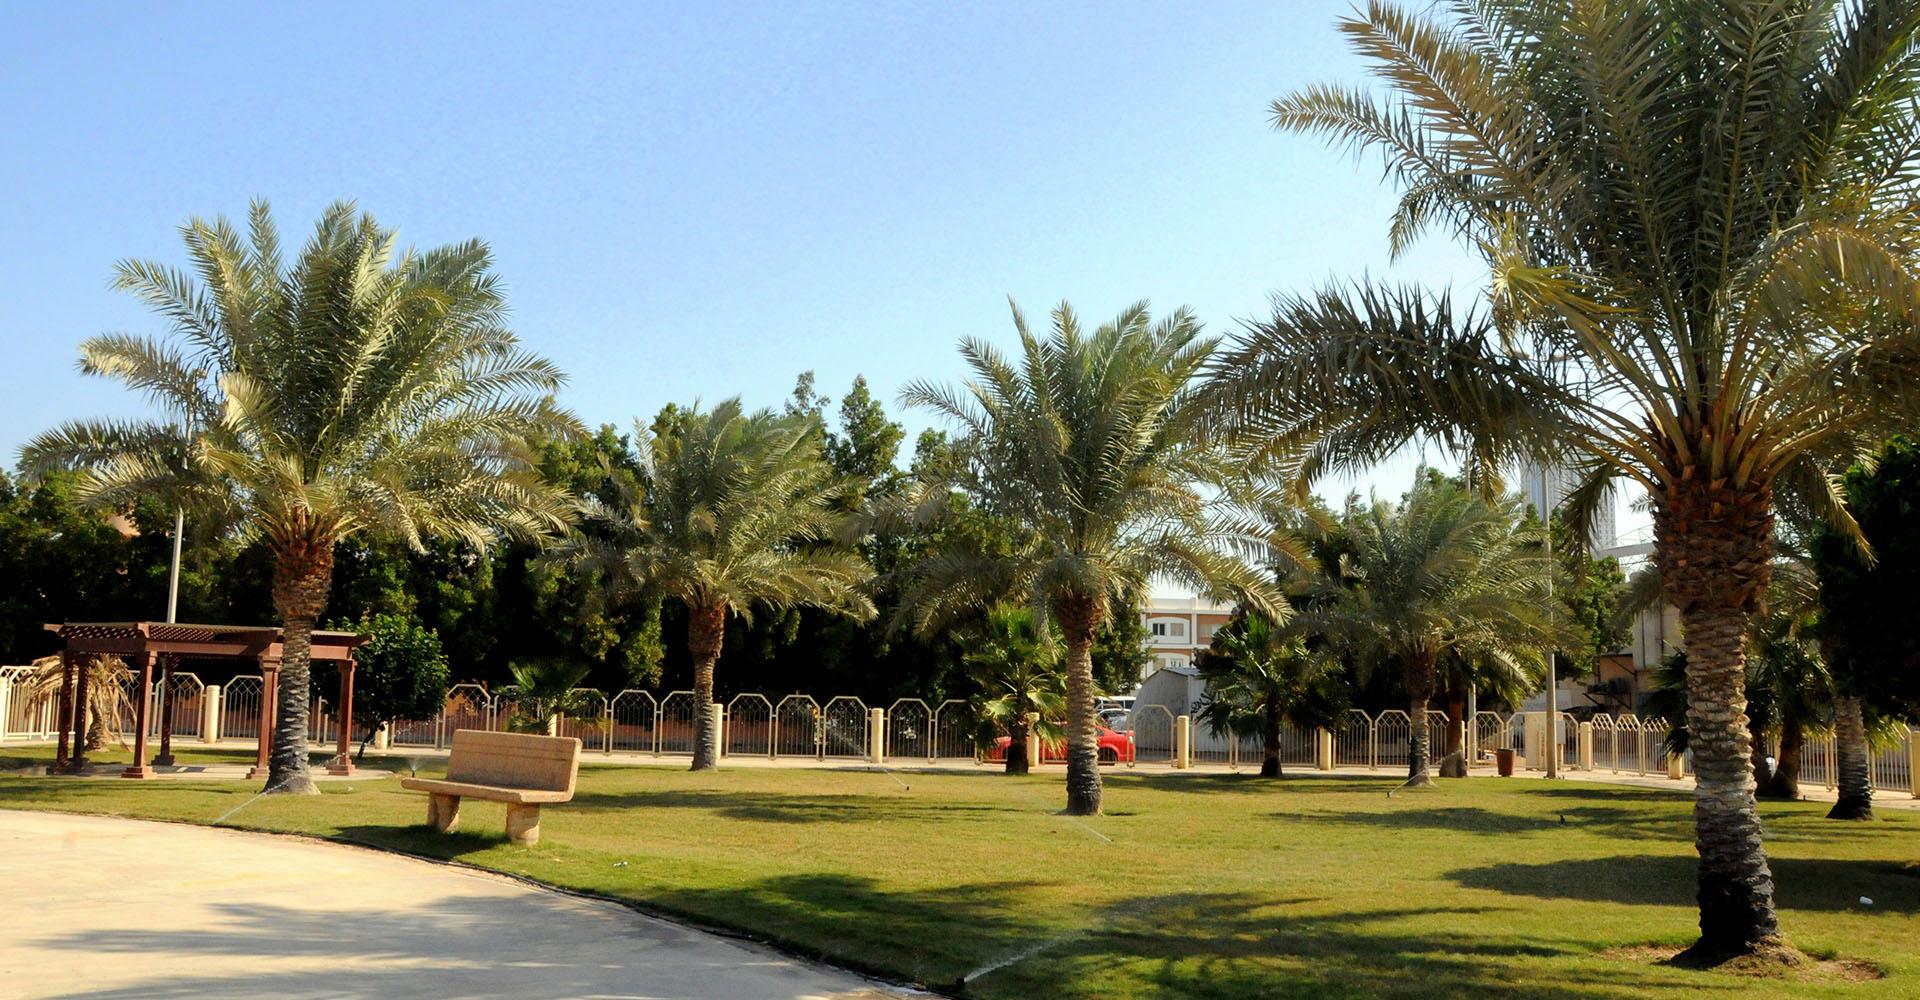 Qurtoba Park